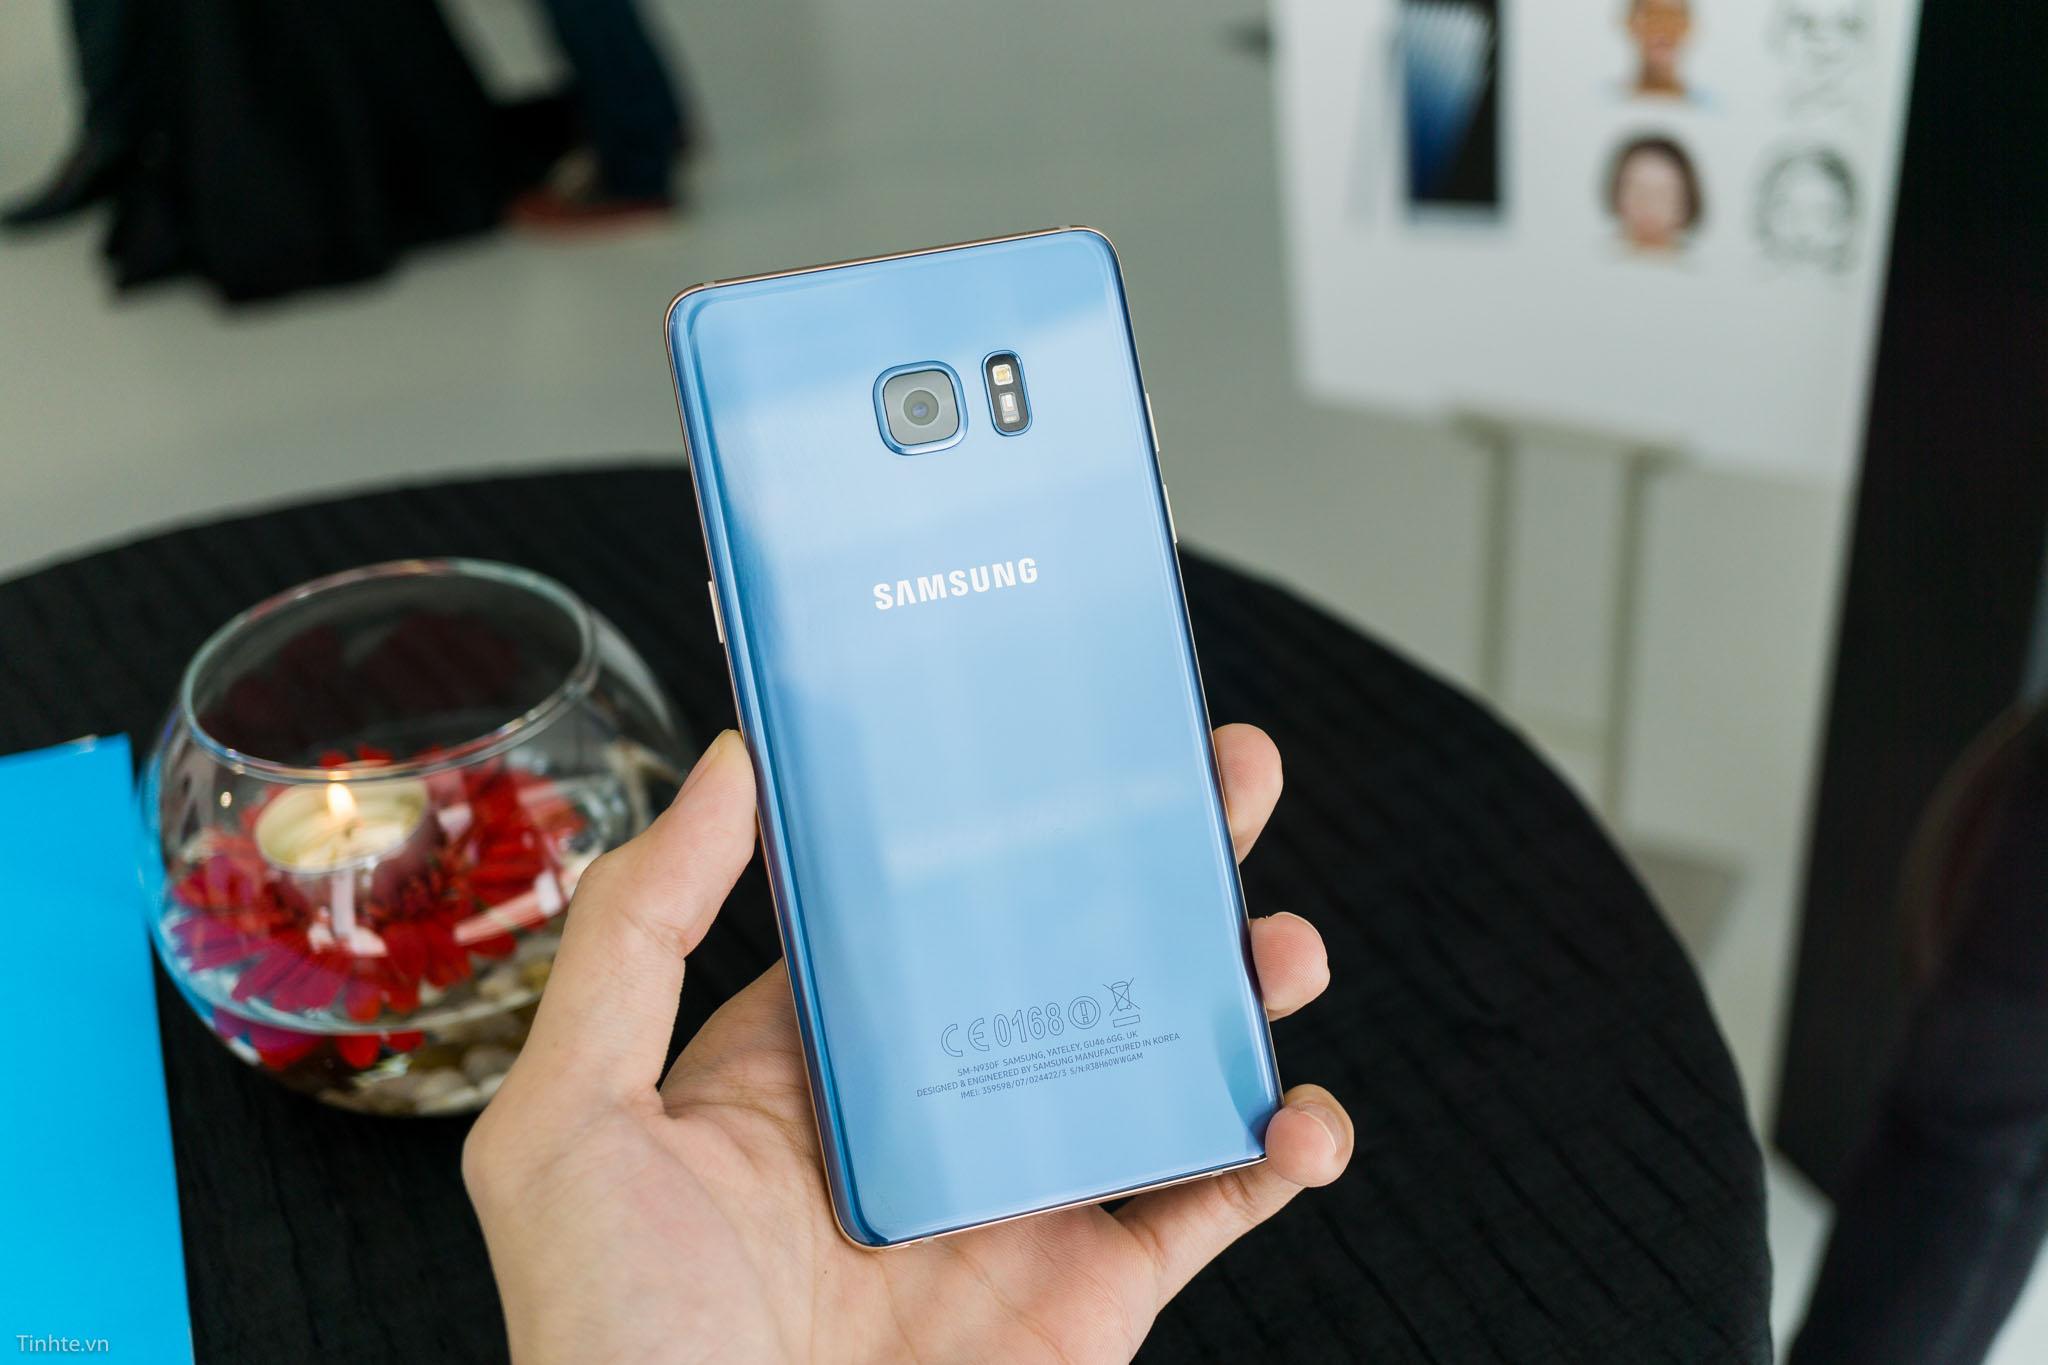 Samsung_khong_hoi_sinh_Galaxy_Note_7_tinhte_3.jpg